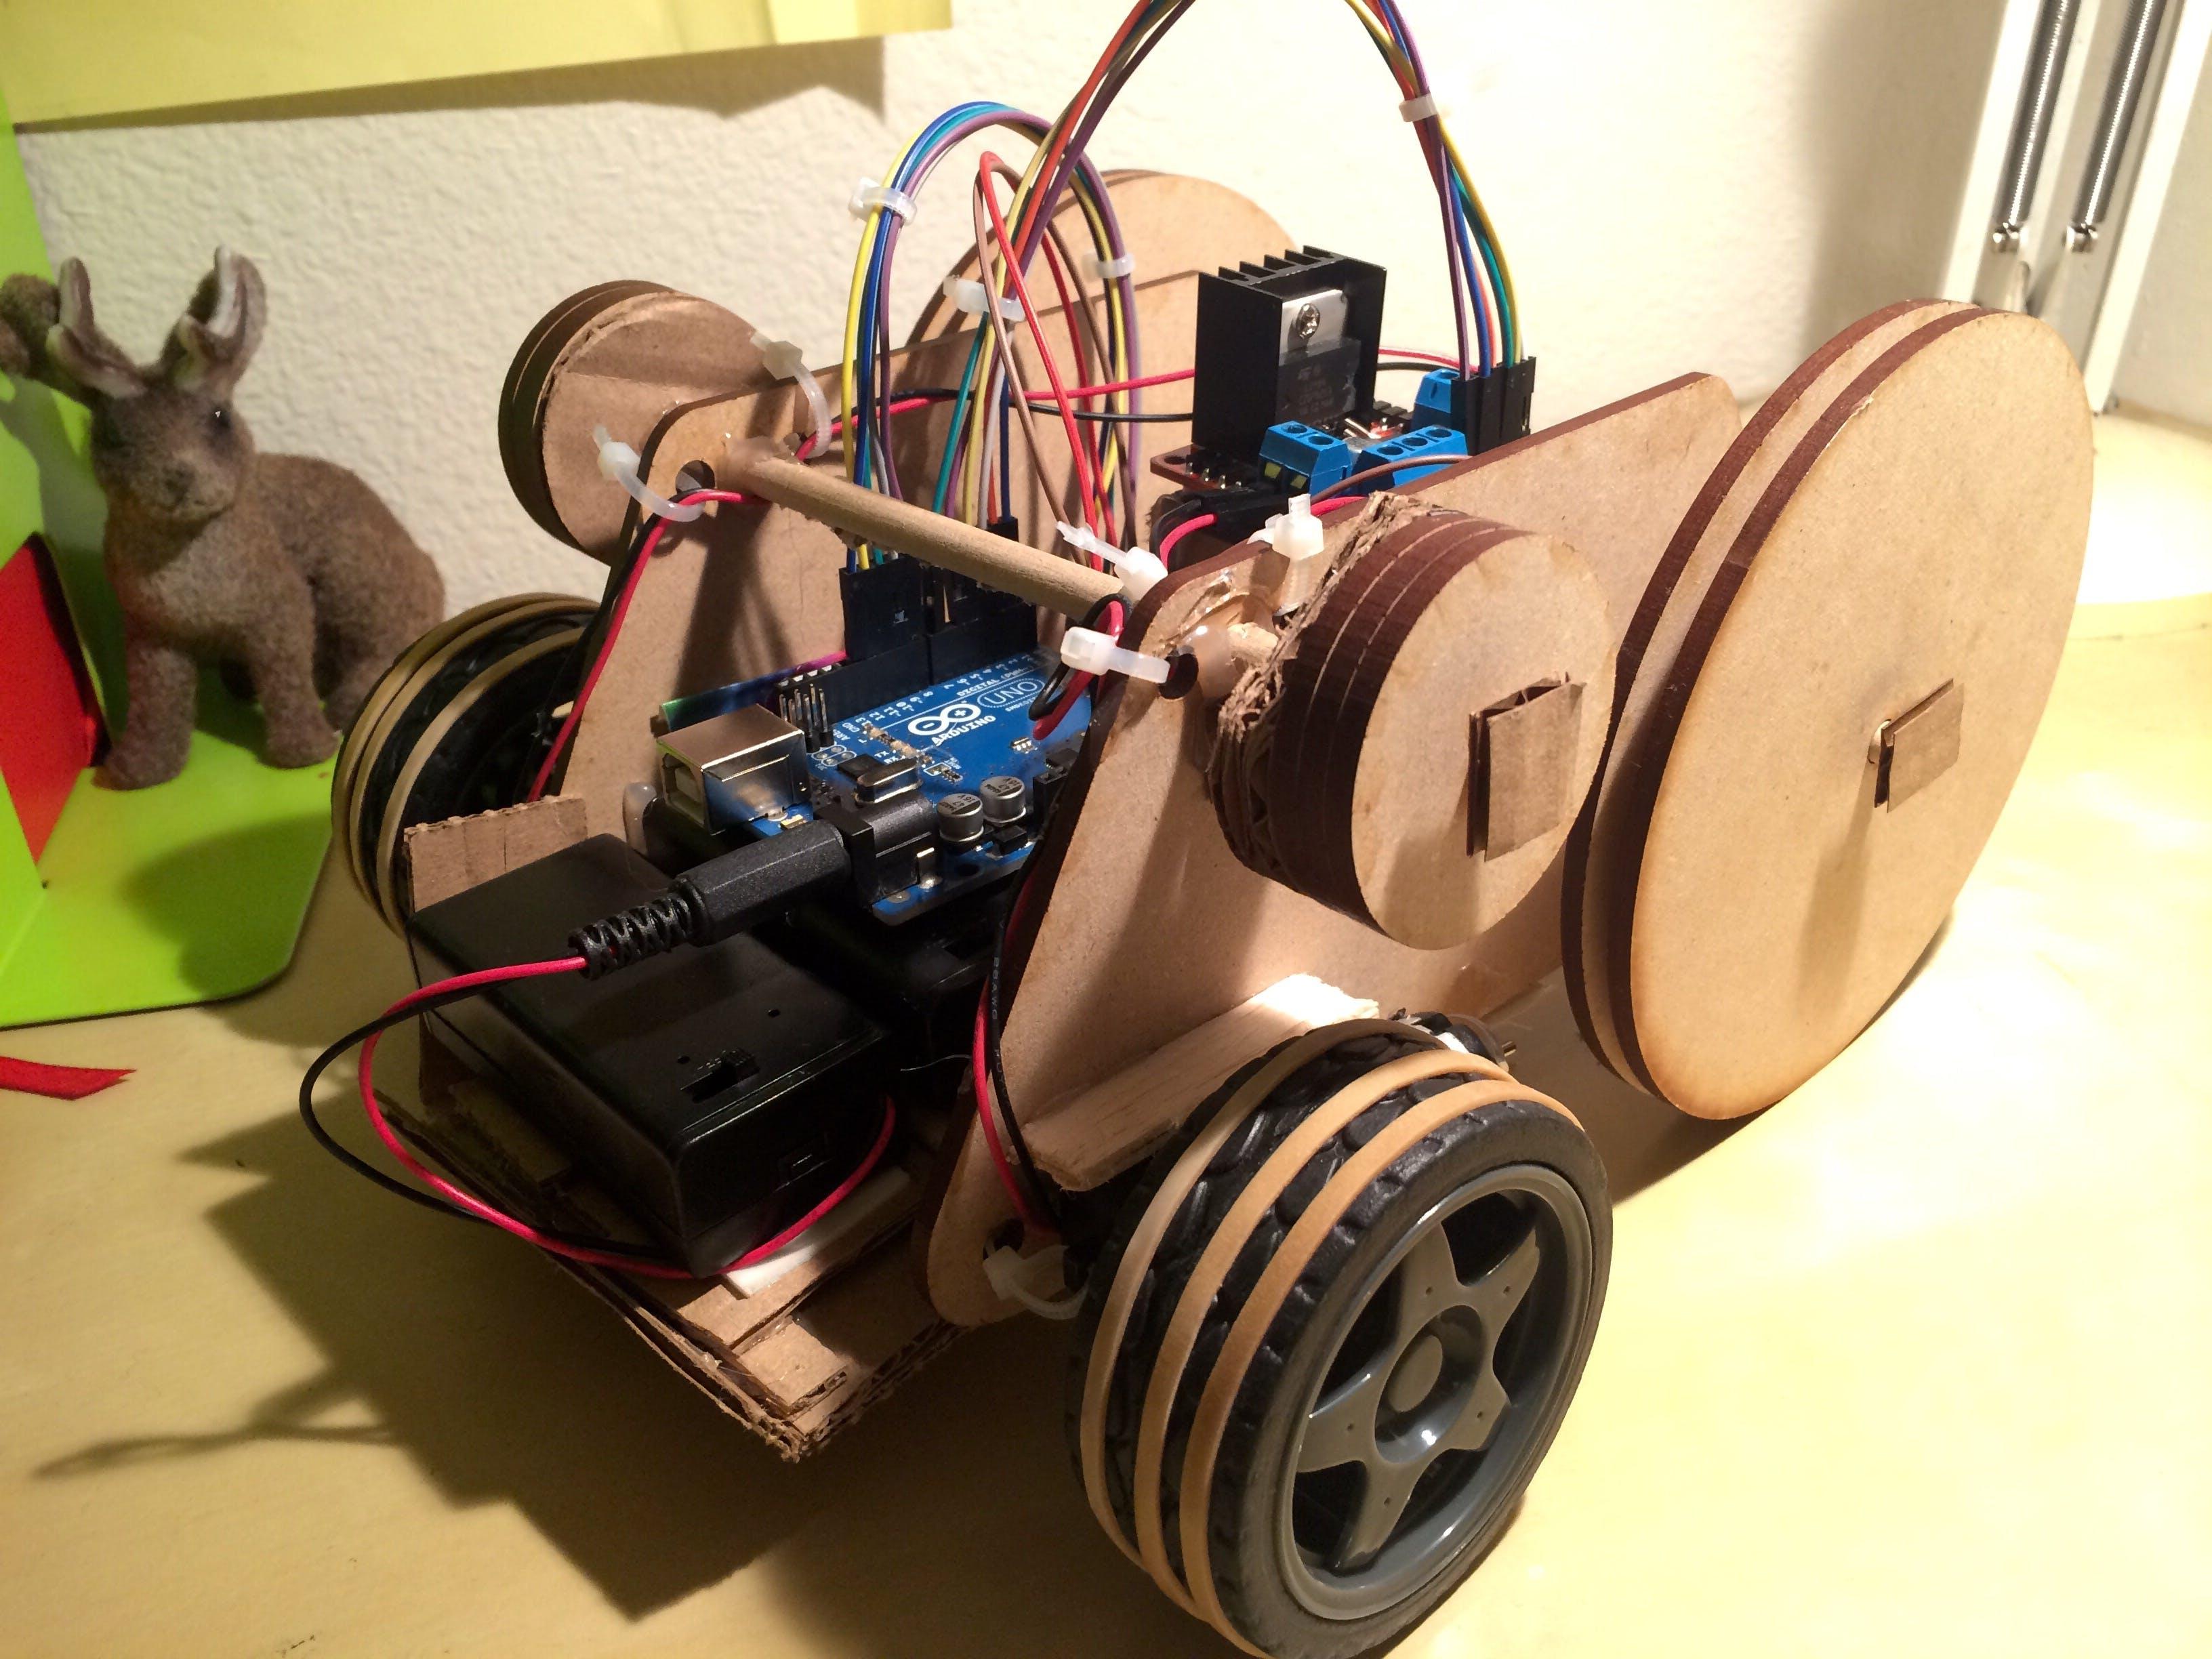 Homework 7: Bluetooth controlled vehicle